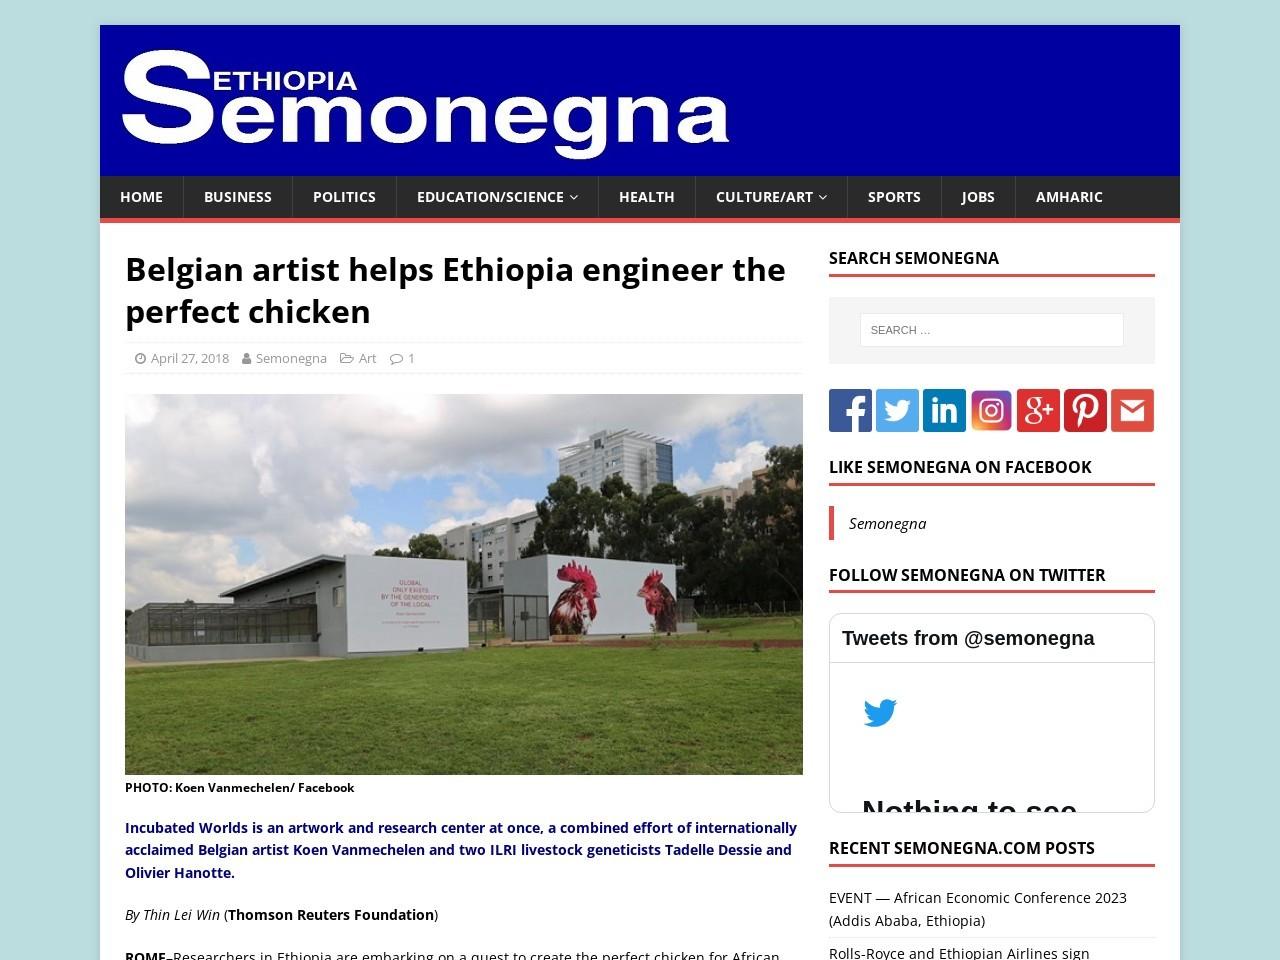 Belgian artist helps Ethiopia engineer the perfect chicken